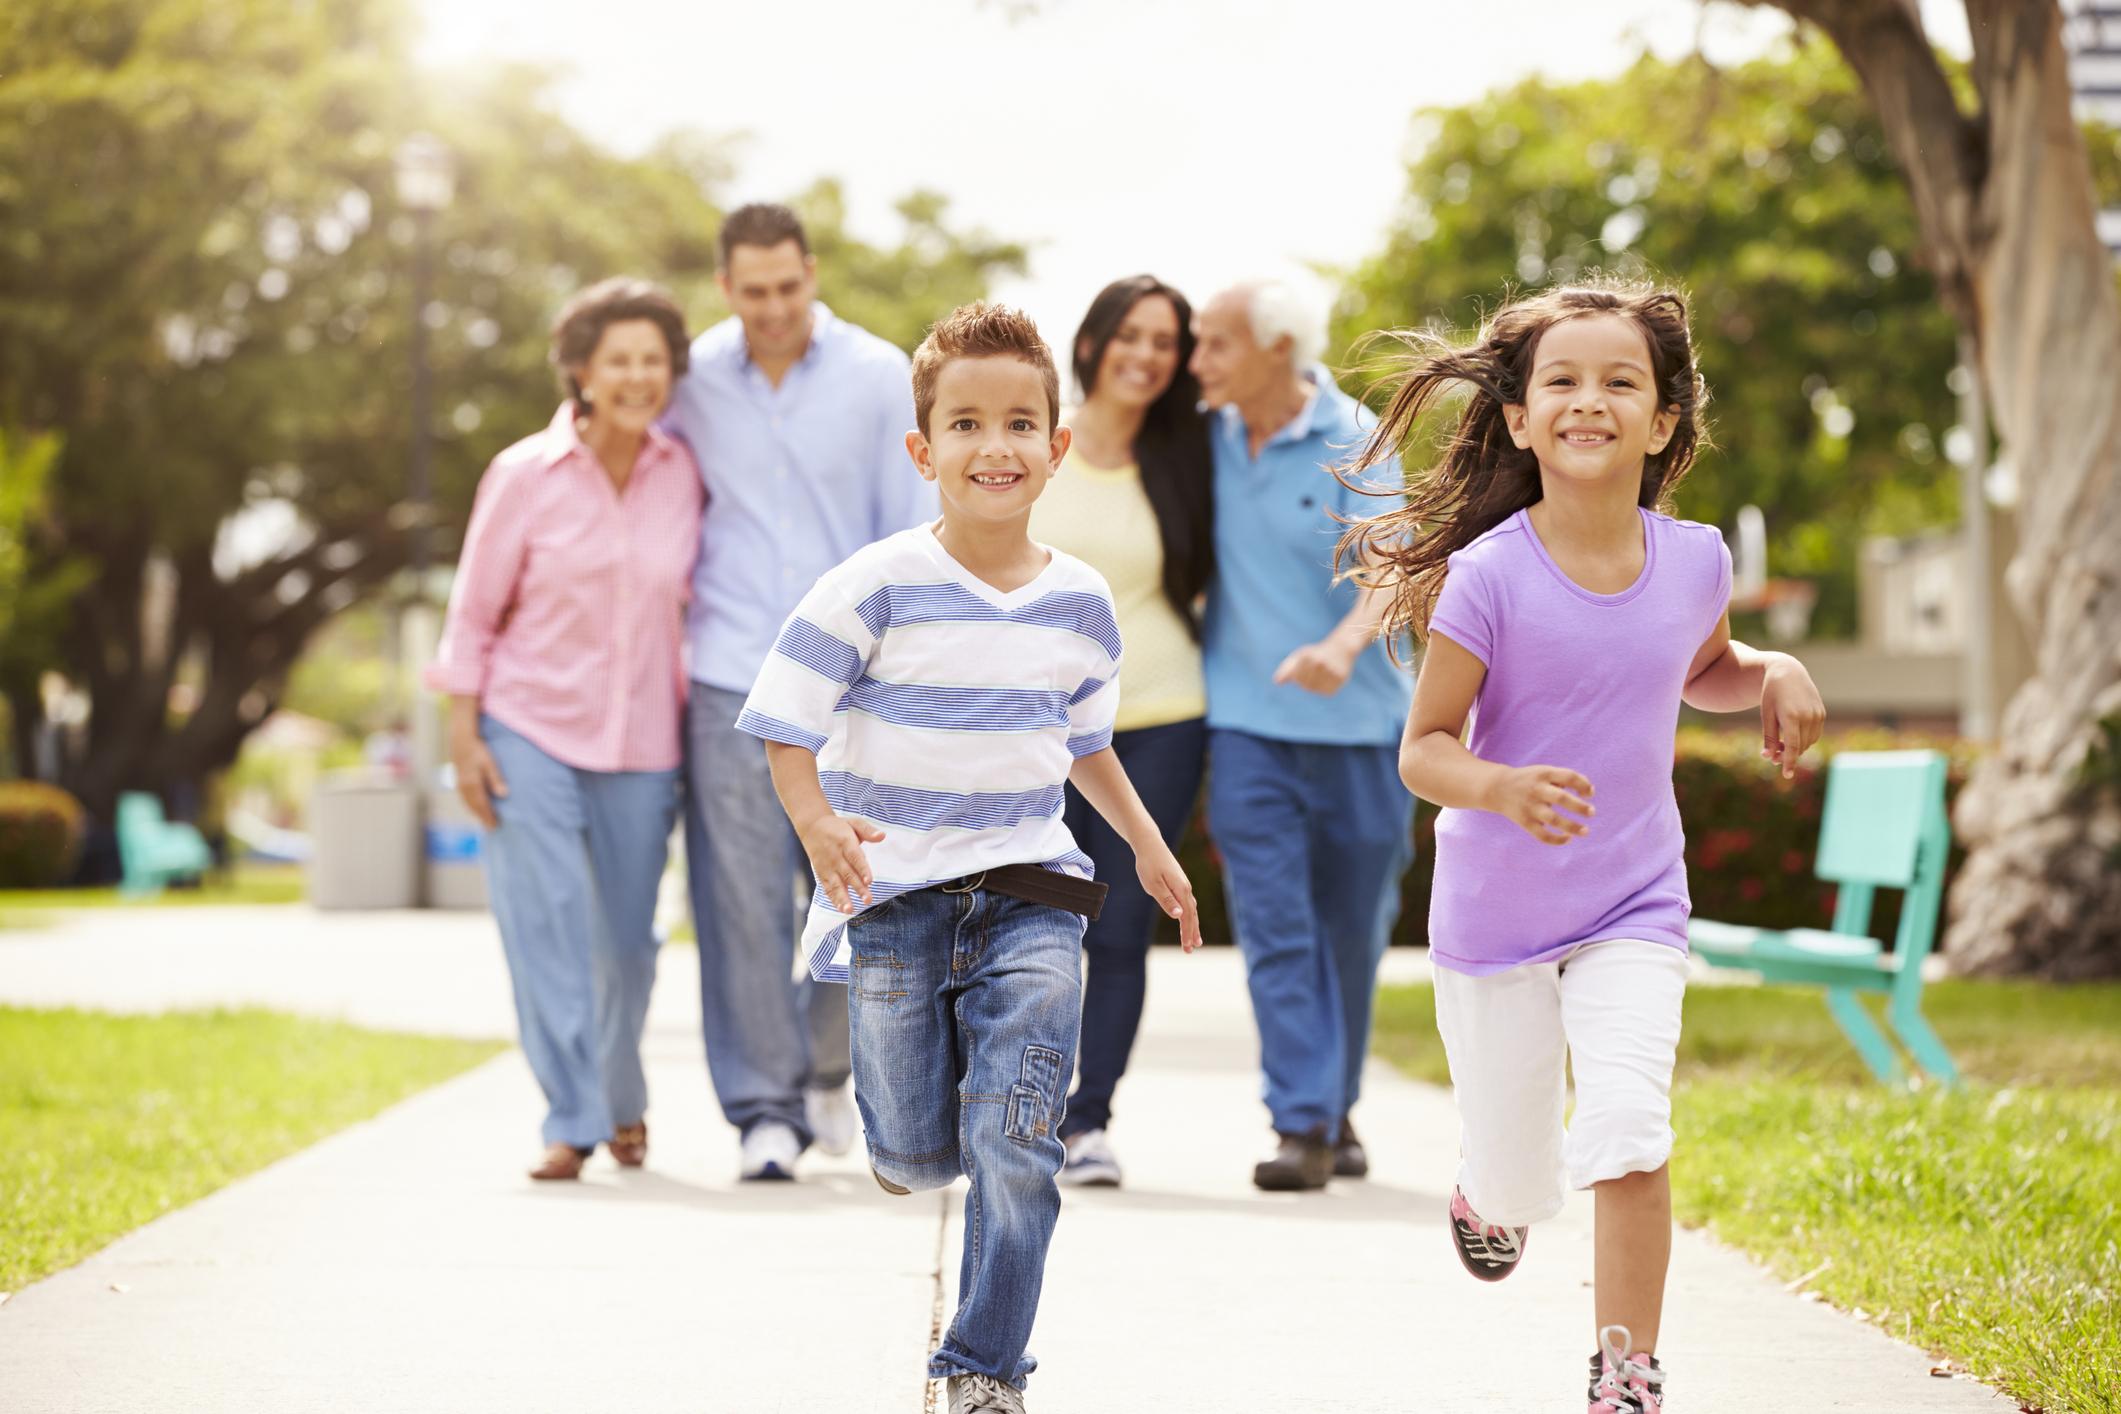 Have kids, live longer? - Harvard Health Blog - Harvard Health